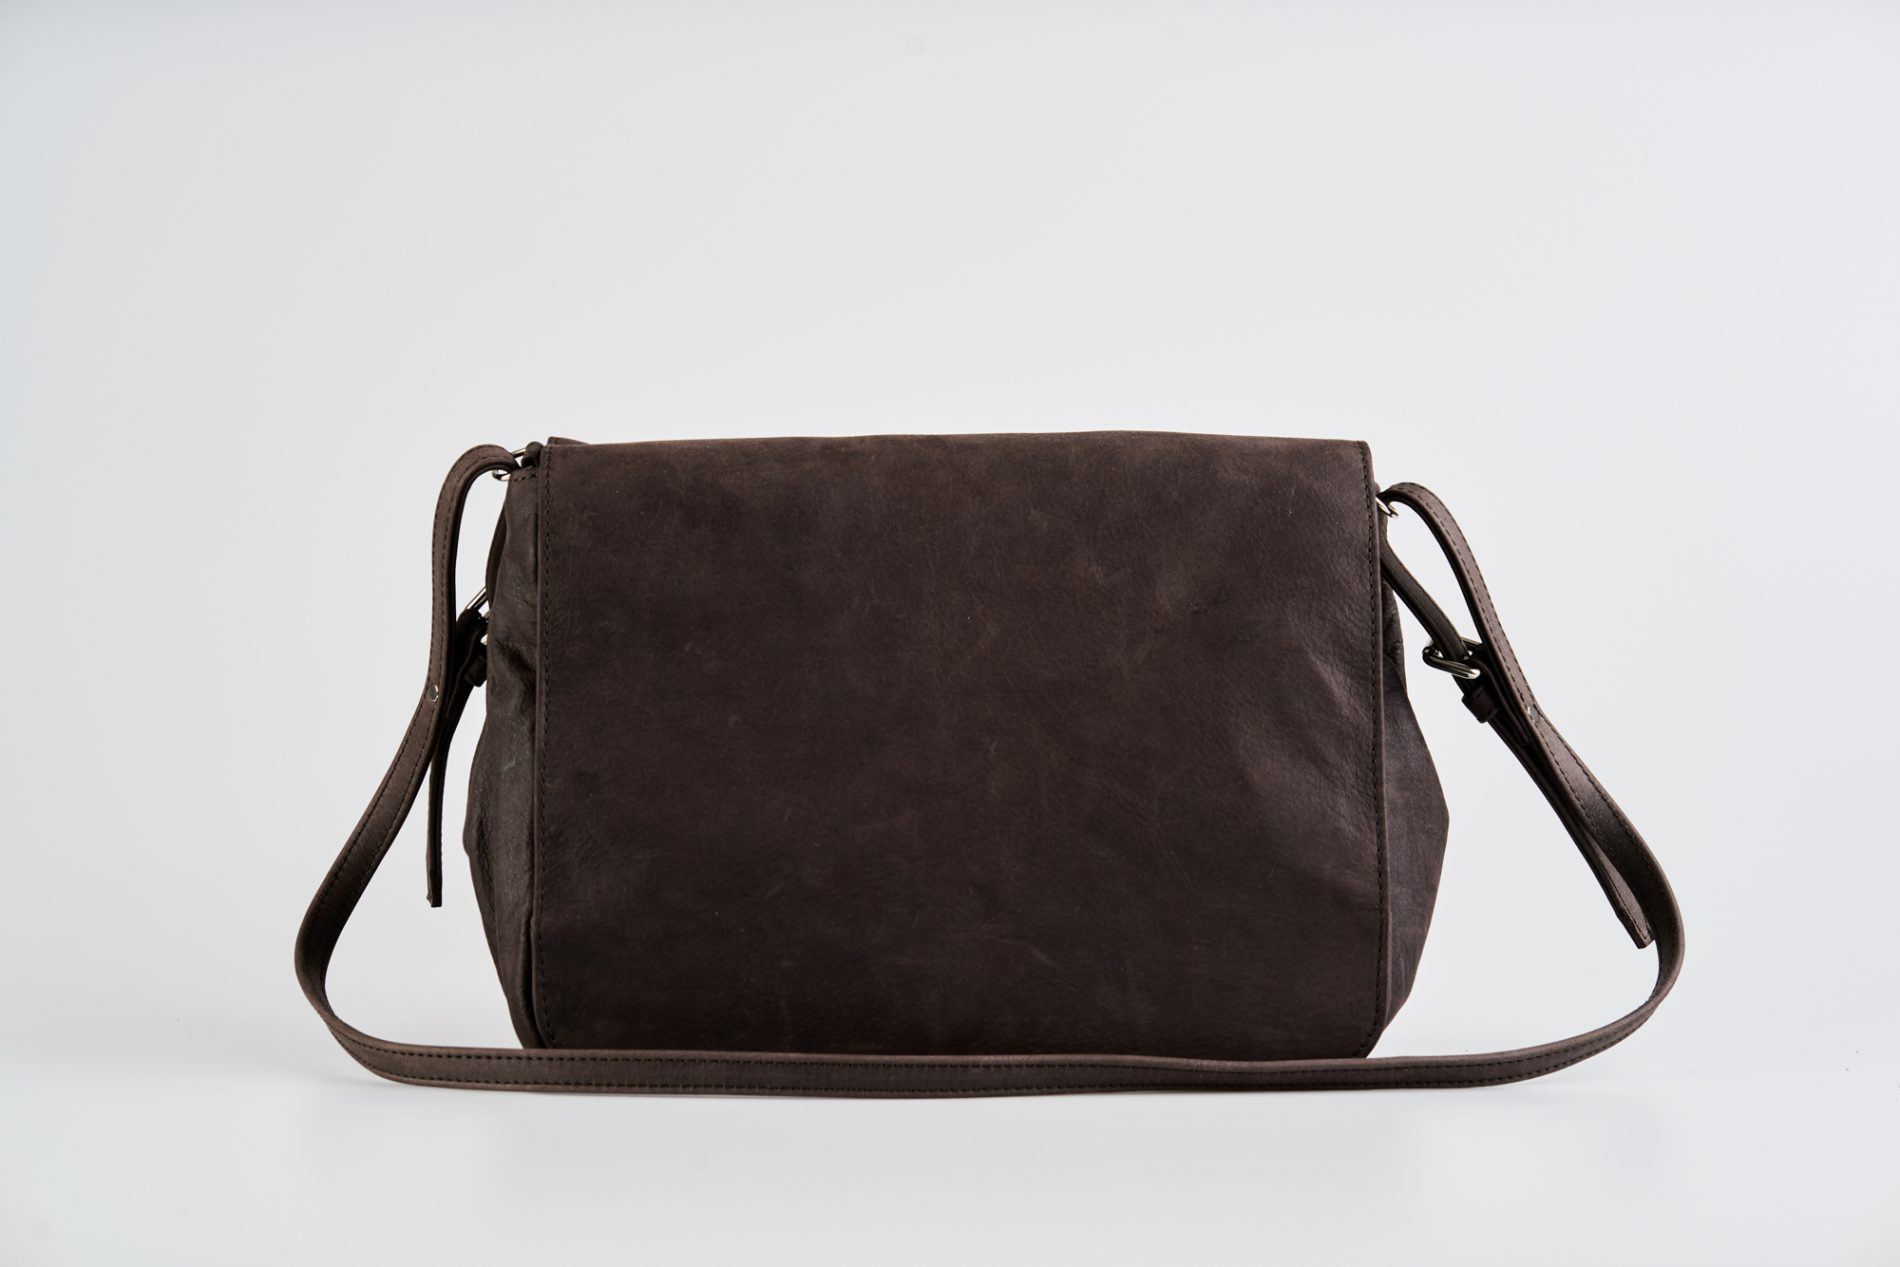 456c285fcf41 Brown Vegetable Tanned Leather Shoulder Bag | Ina Koelln